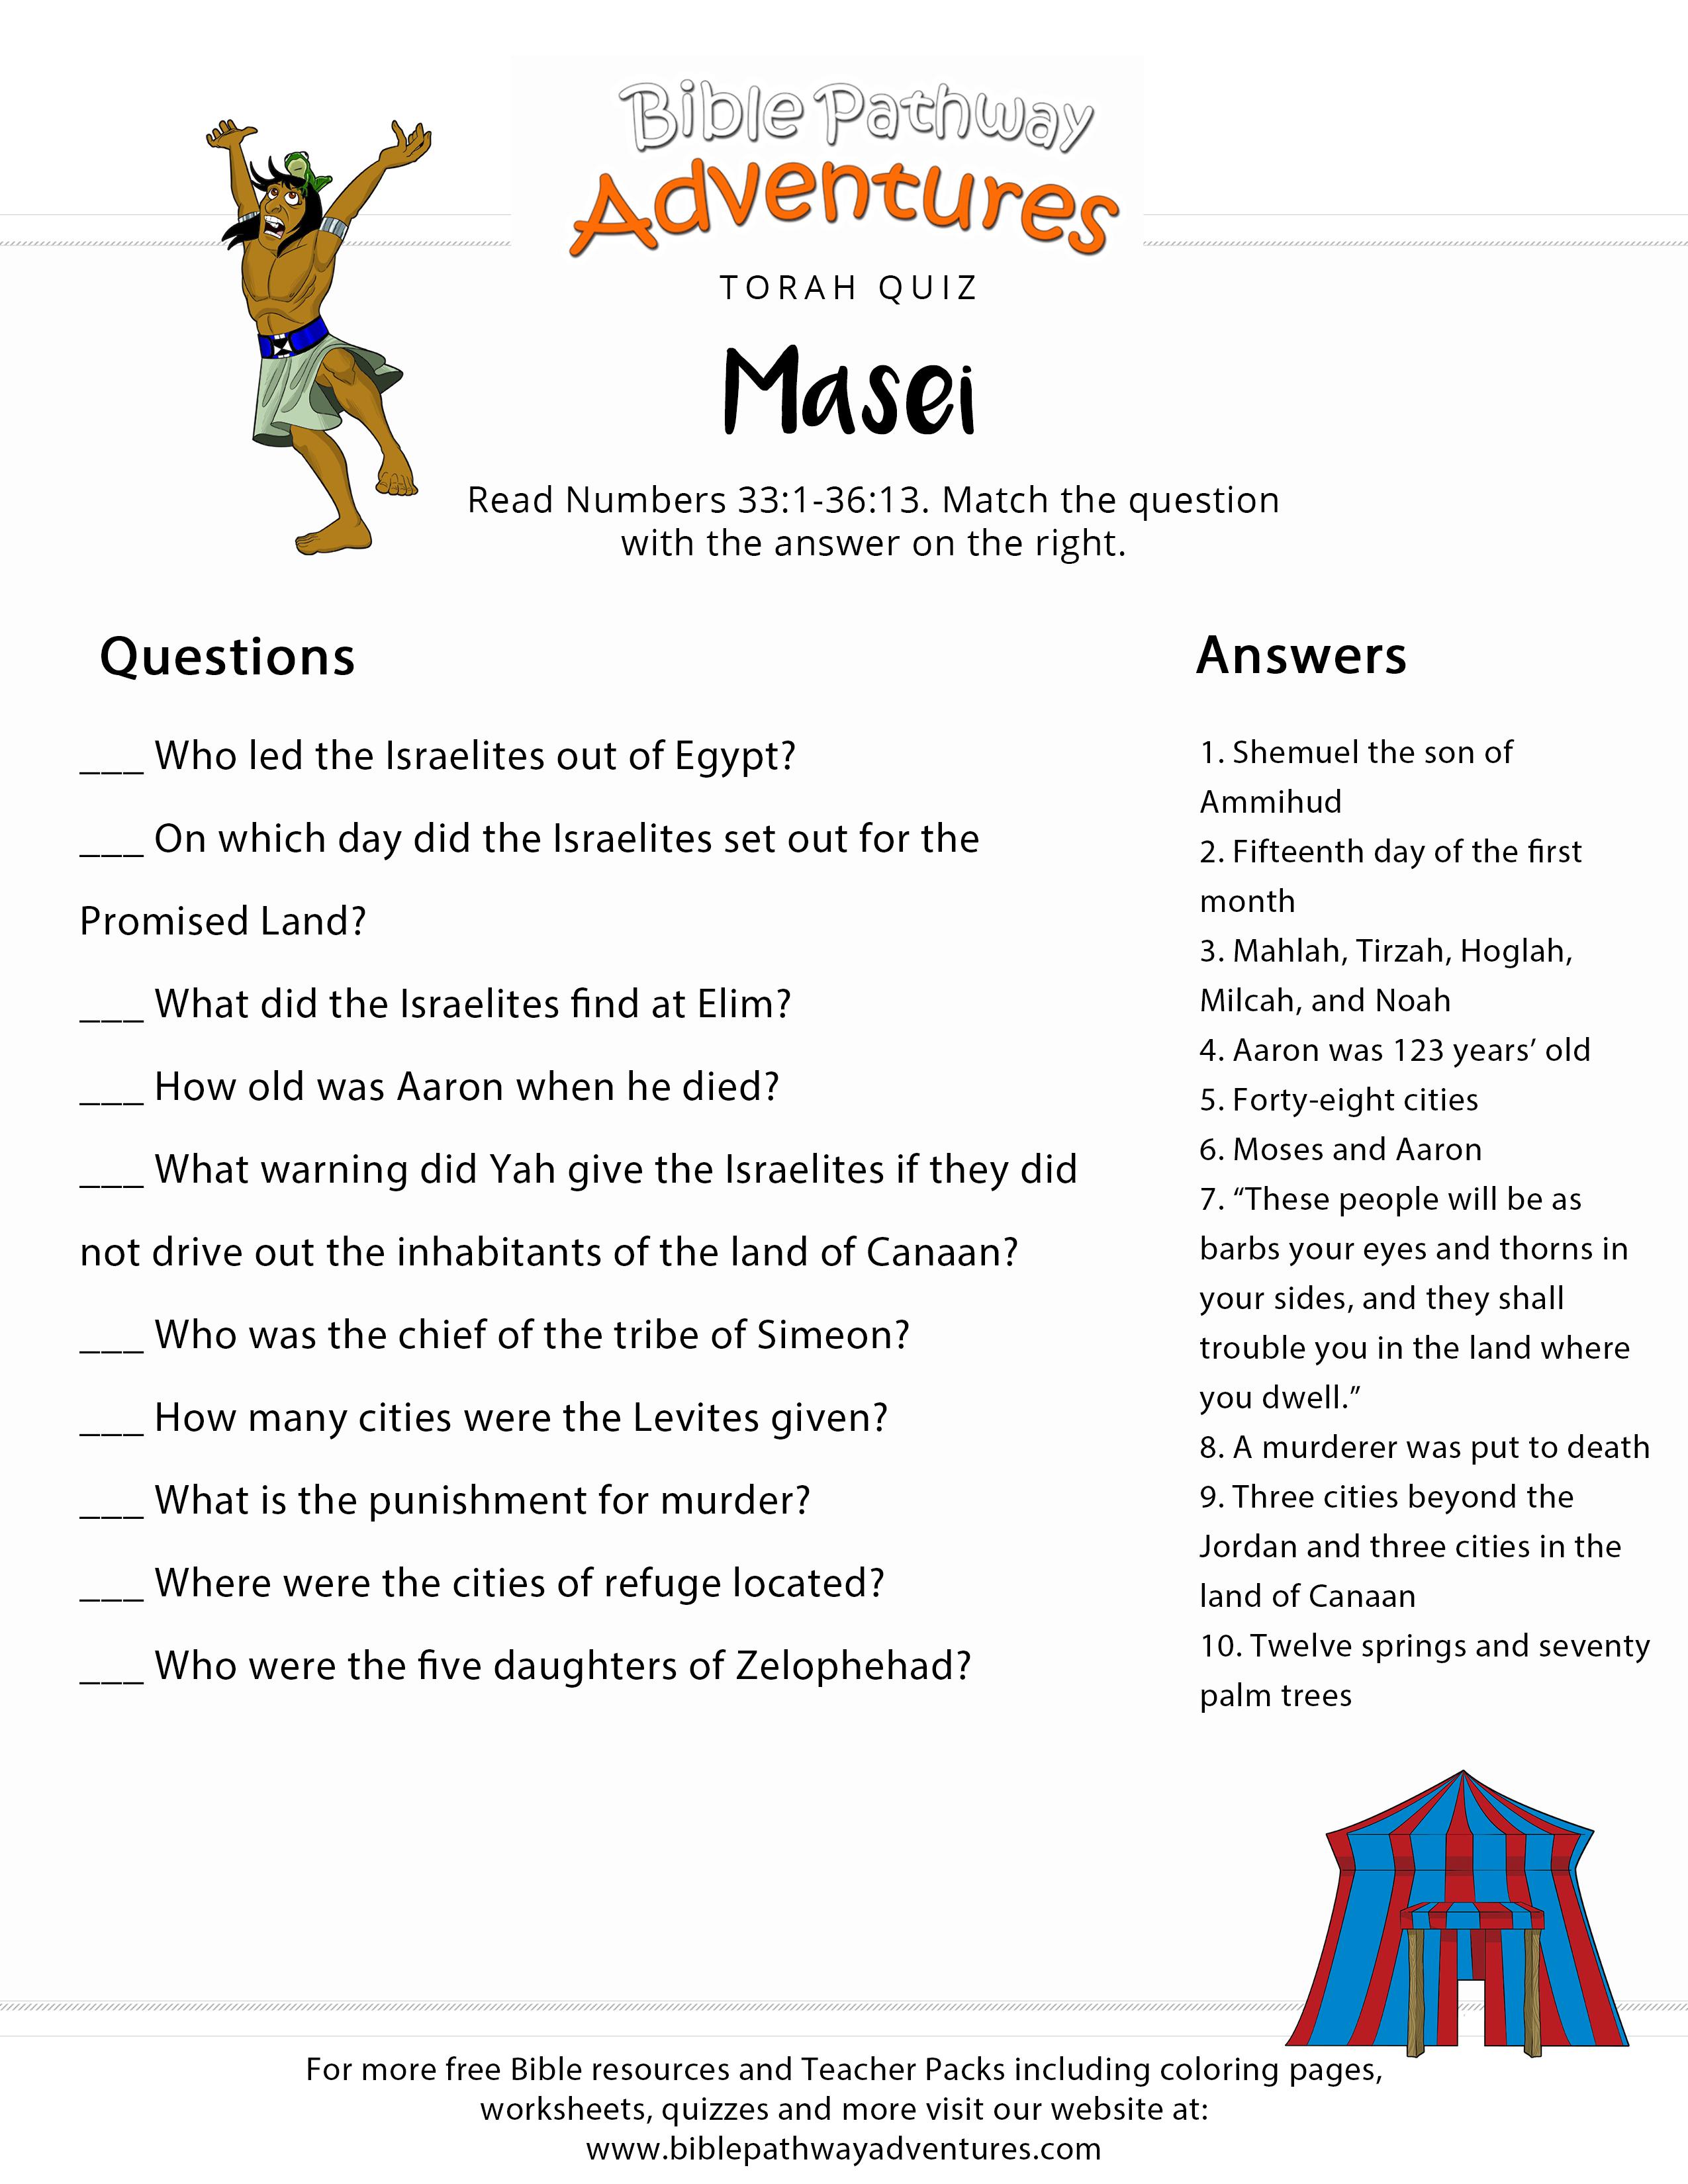 Image result for masei torah portion bible quiz images